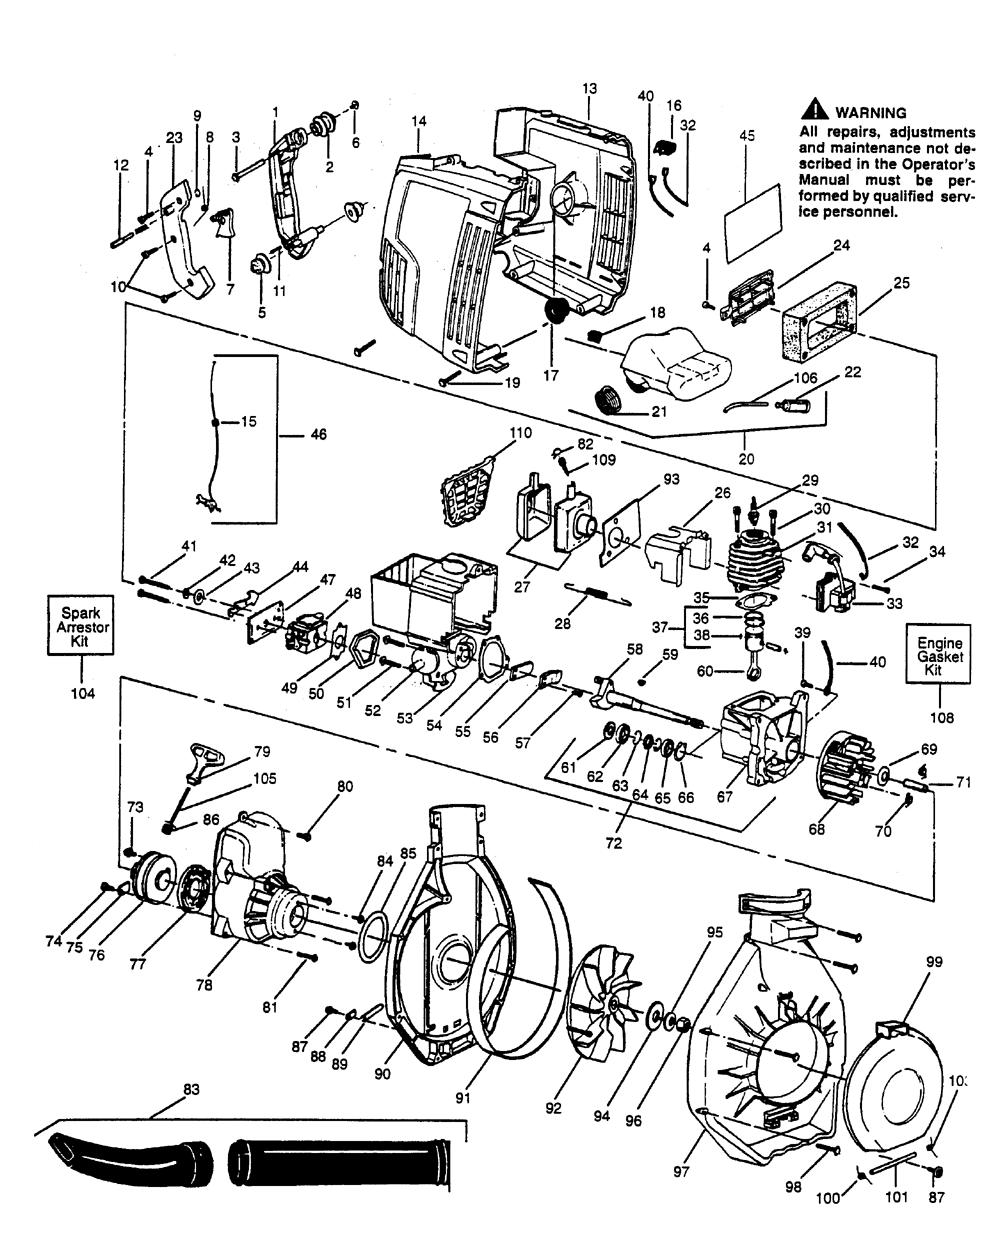 Buy husqvarna 132hbv type 1 replacement tool parts husqvarna